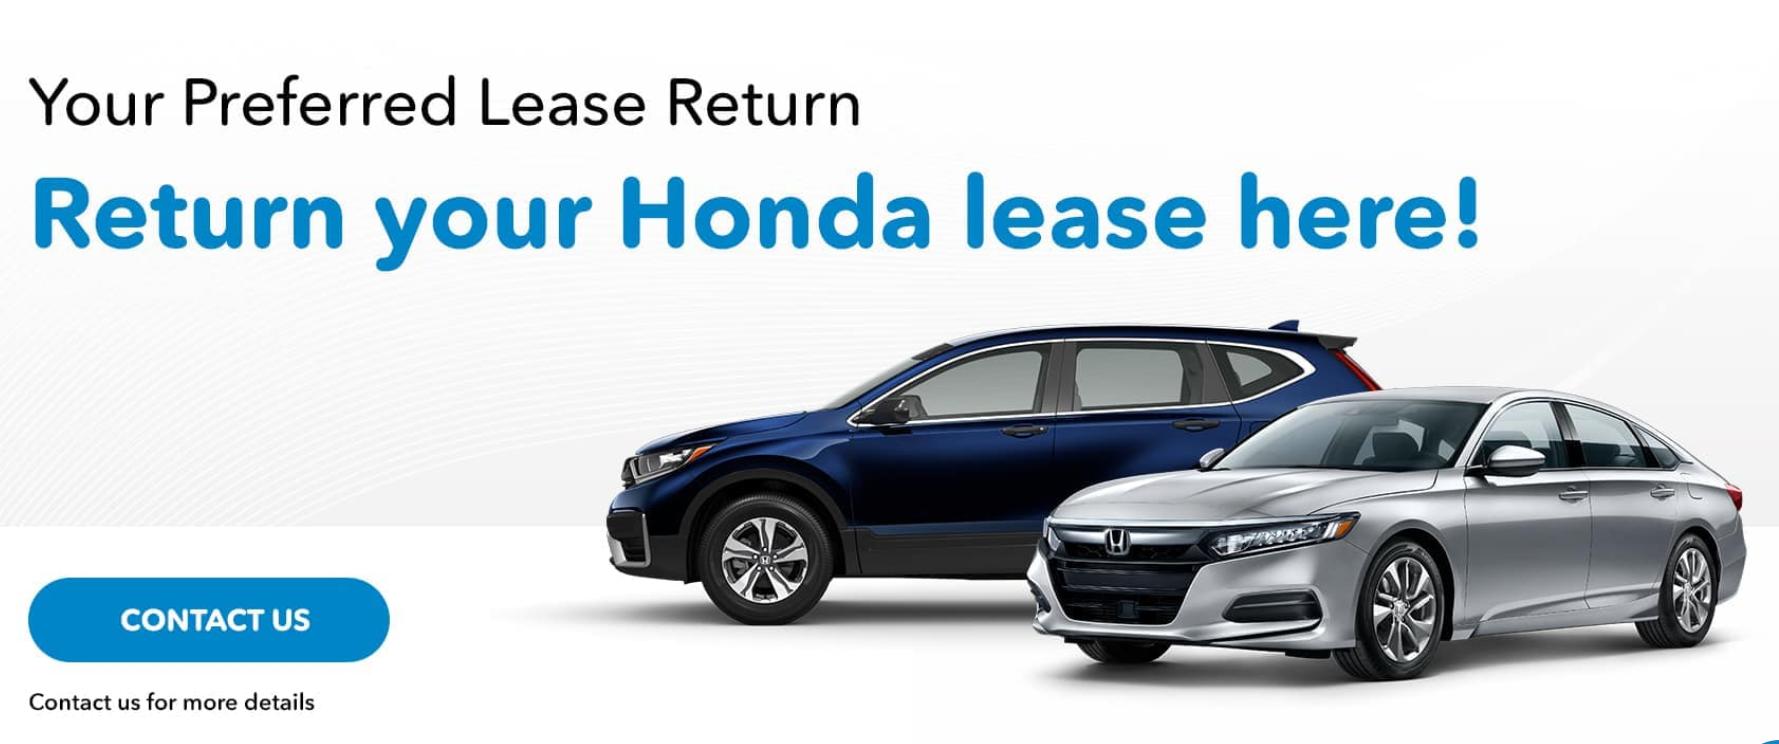 Honda Lease Return